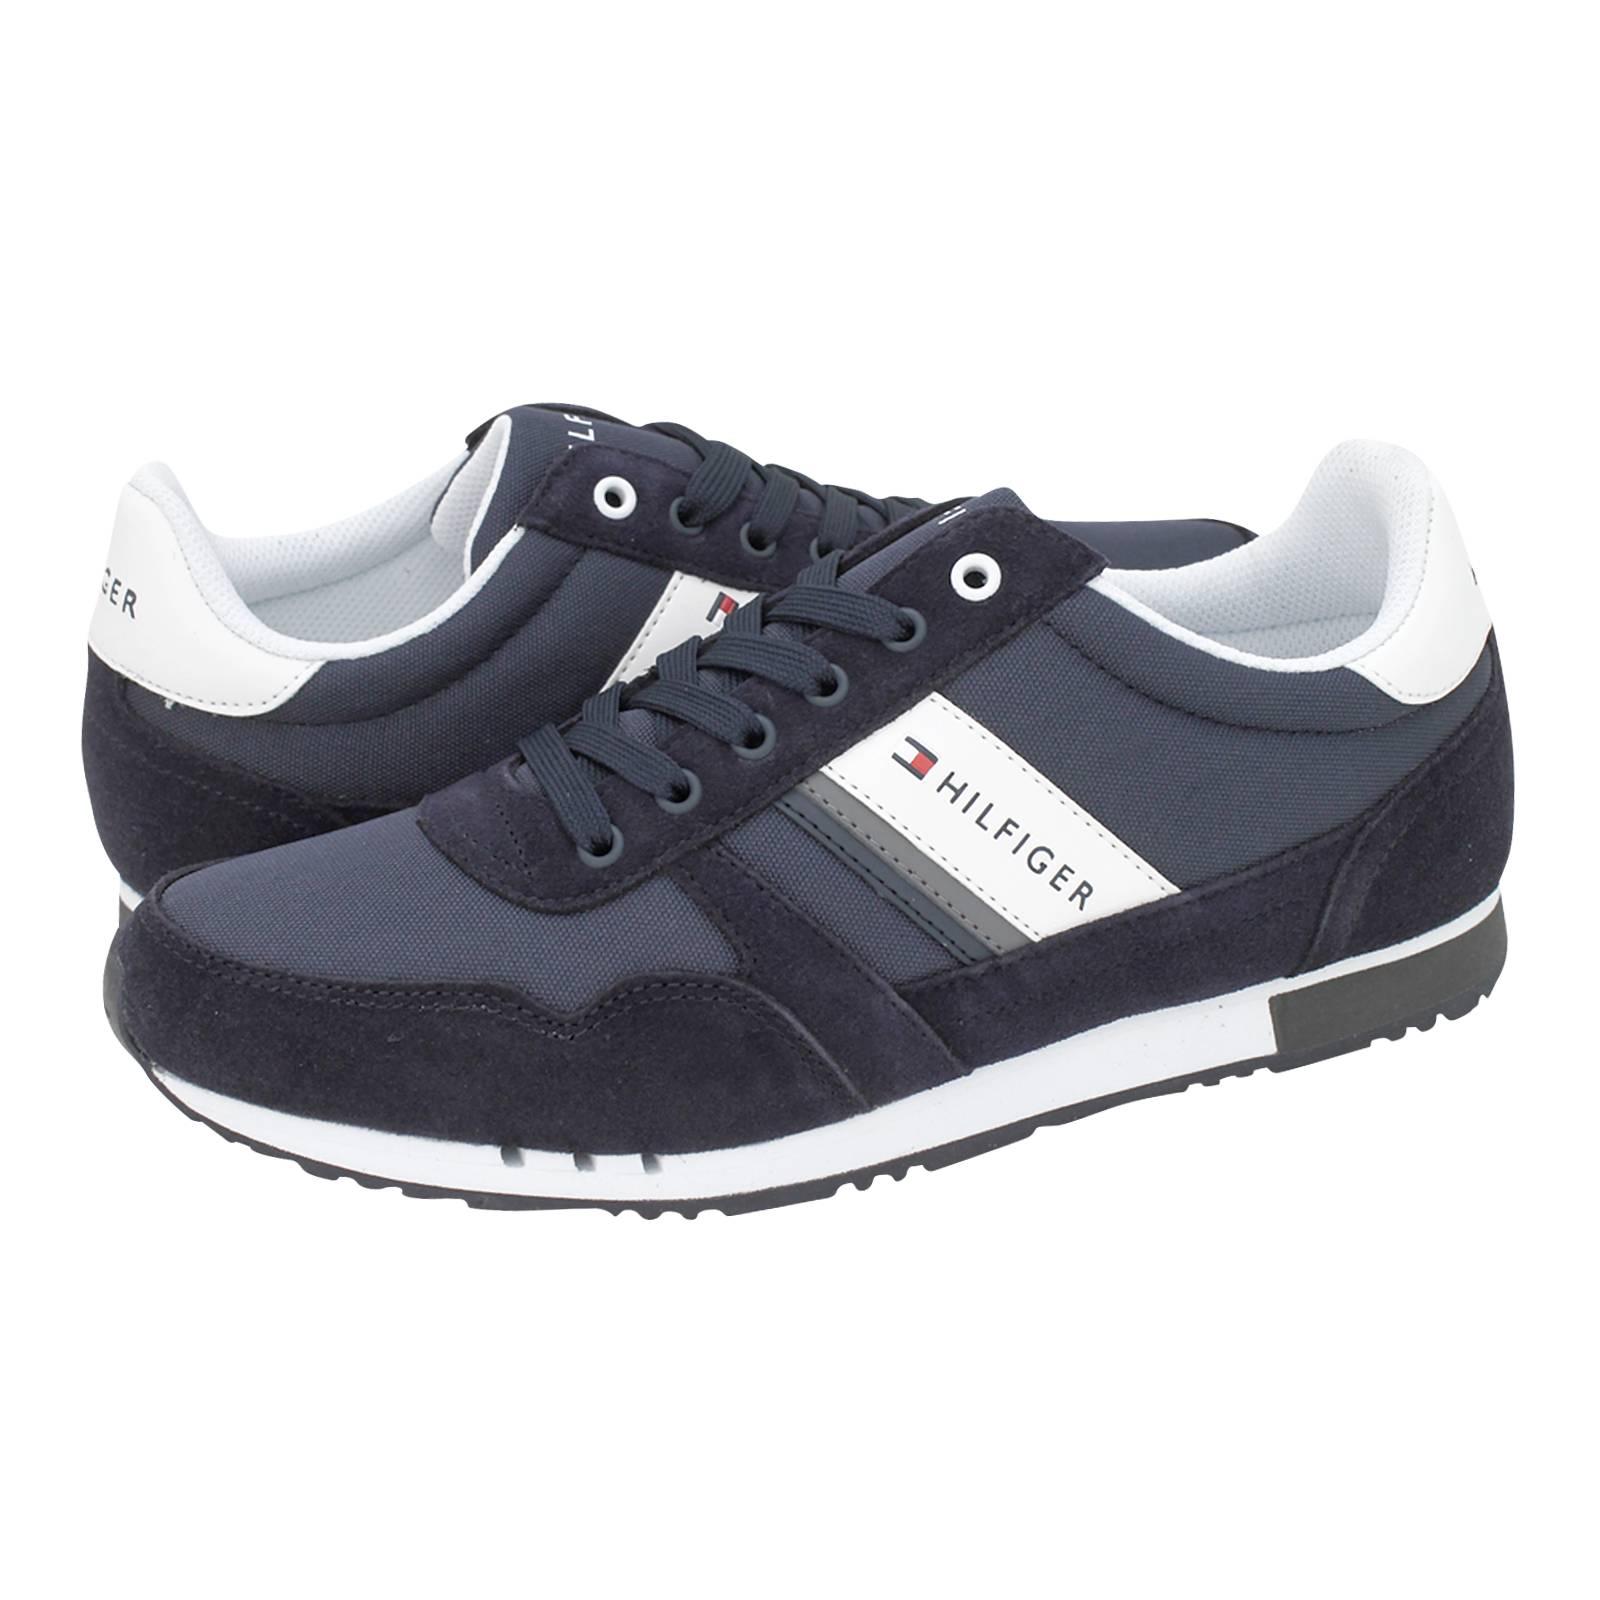 Maxwell 3D - Ανδρικά παπούτσια casual Tommy Hilfiger από καστορι ... 2612396ccde